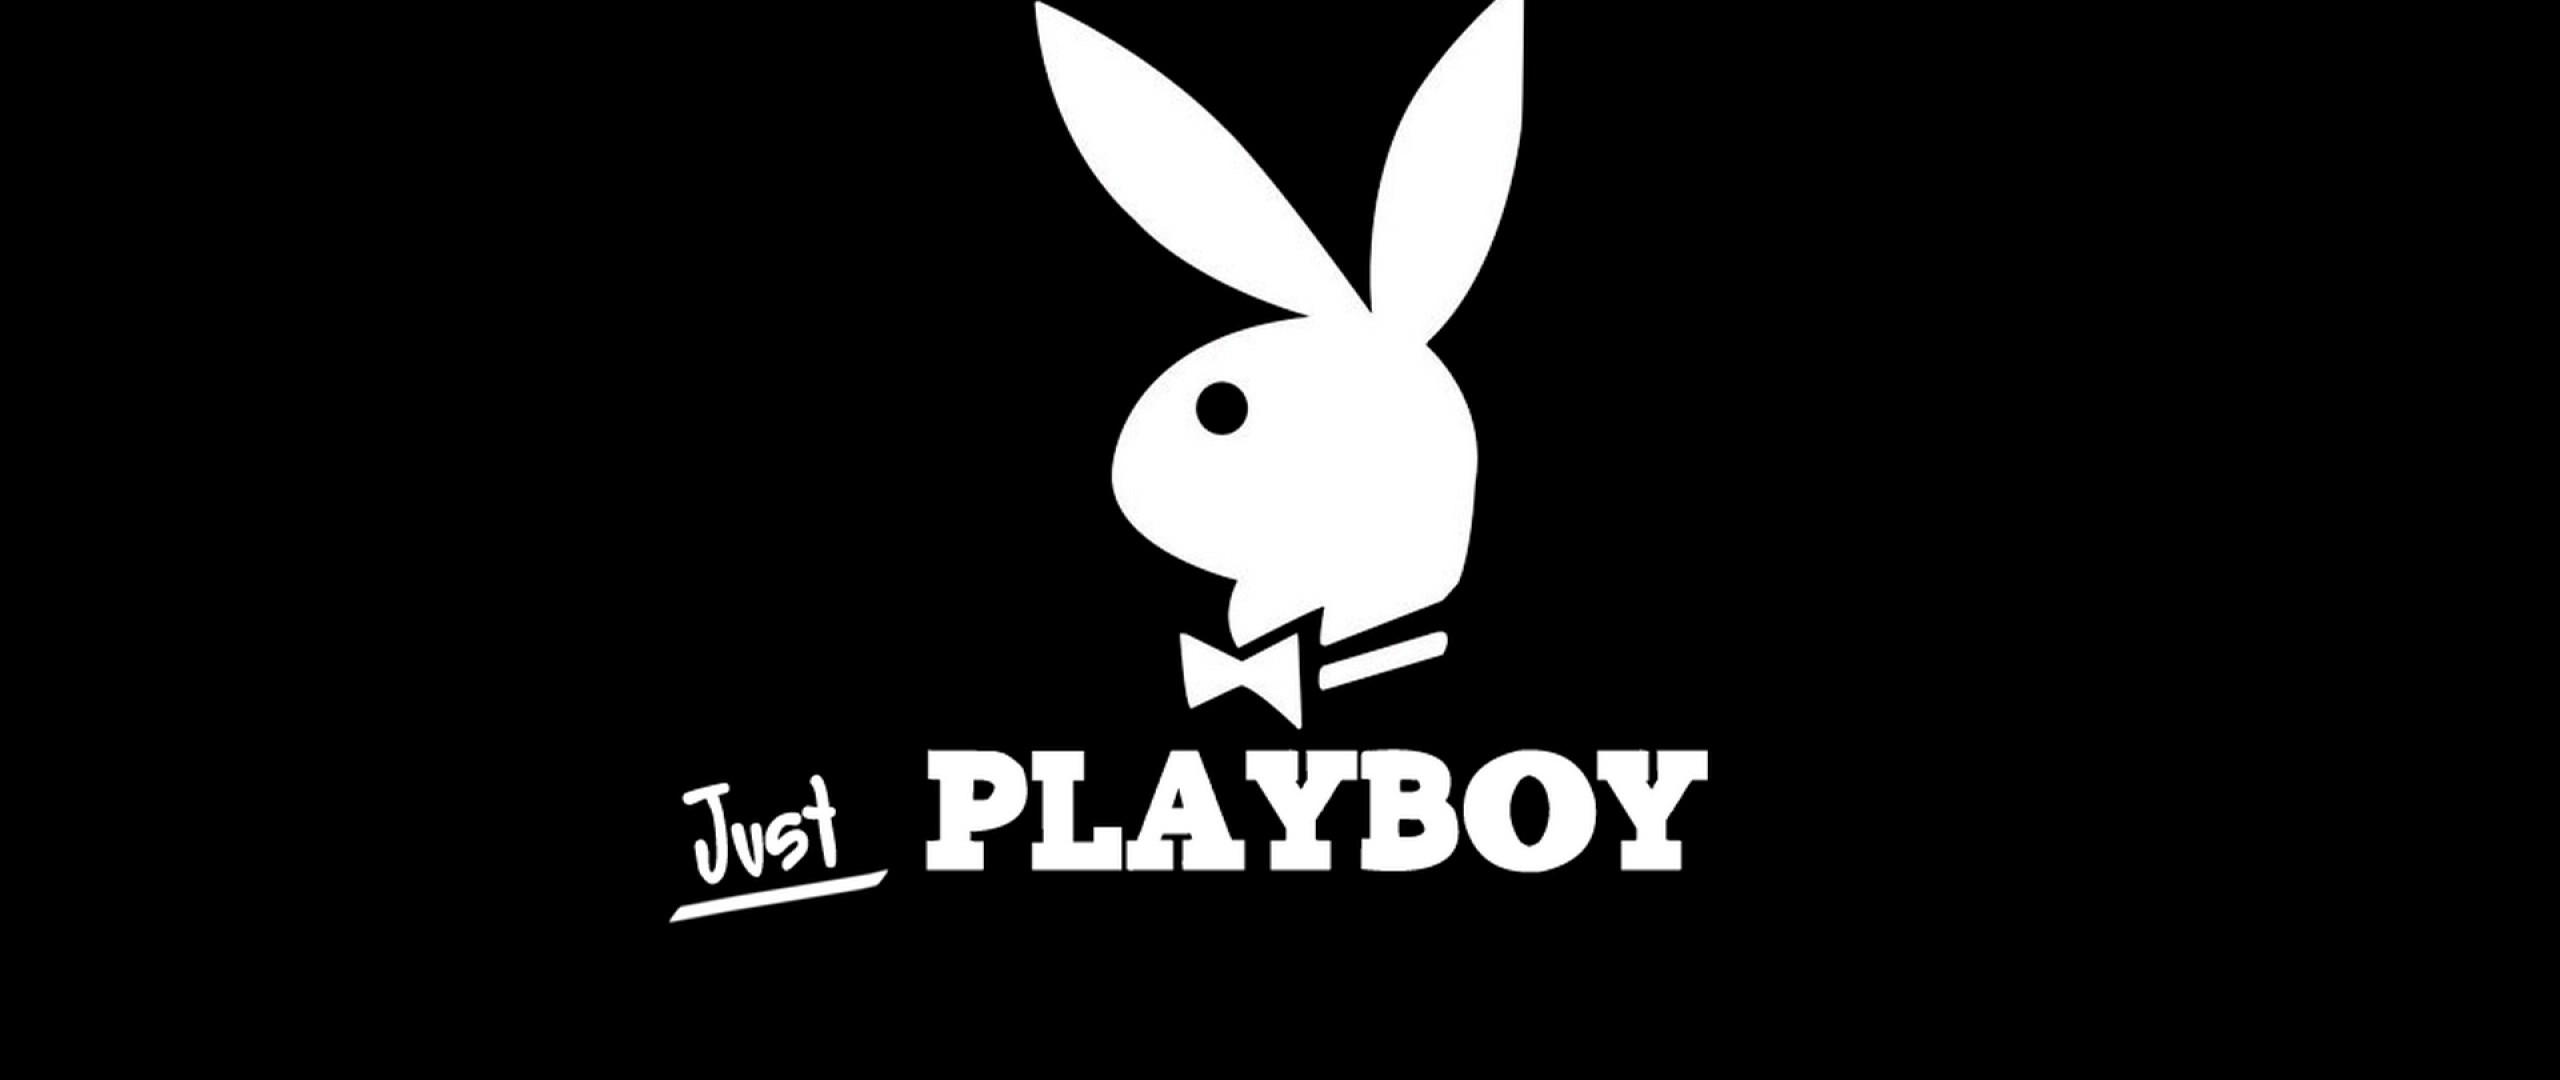 Playstation Logo Wallpaper 77 Images